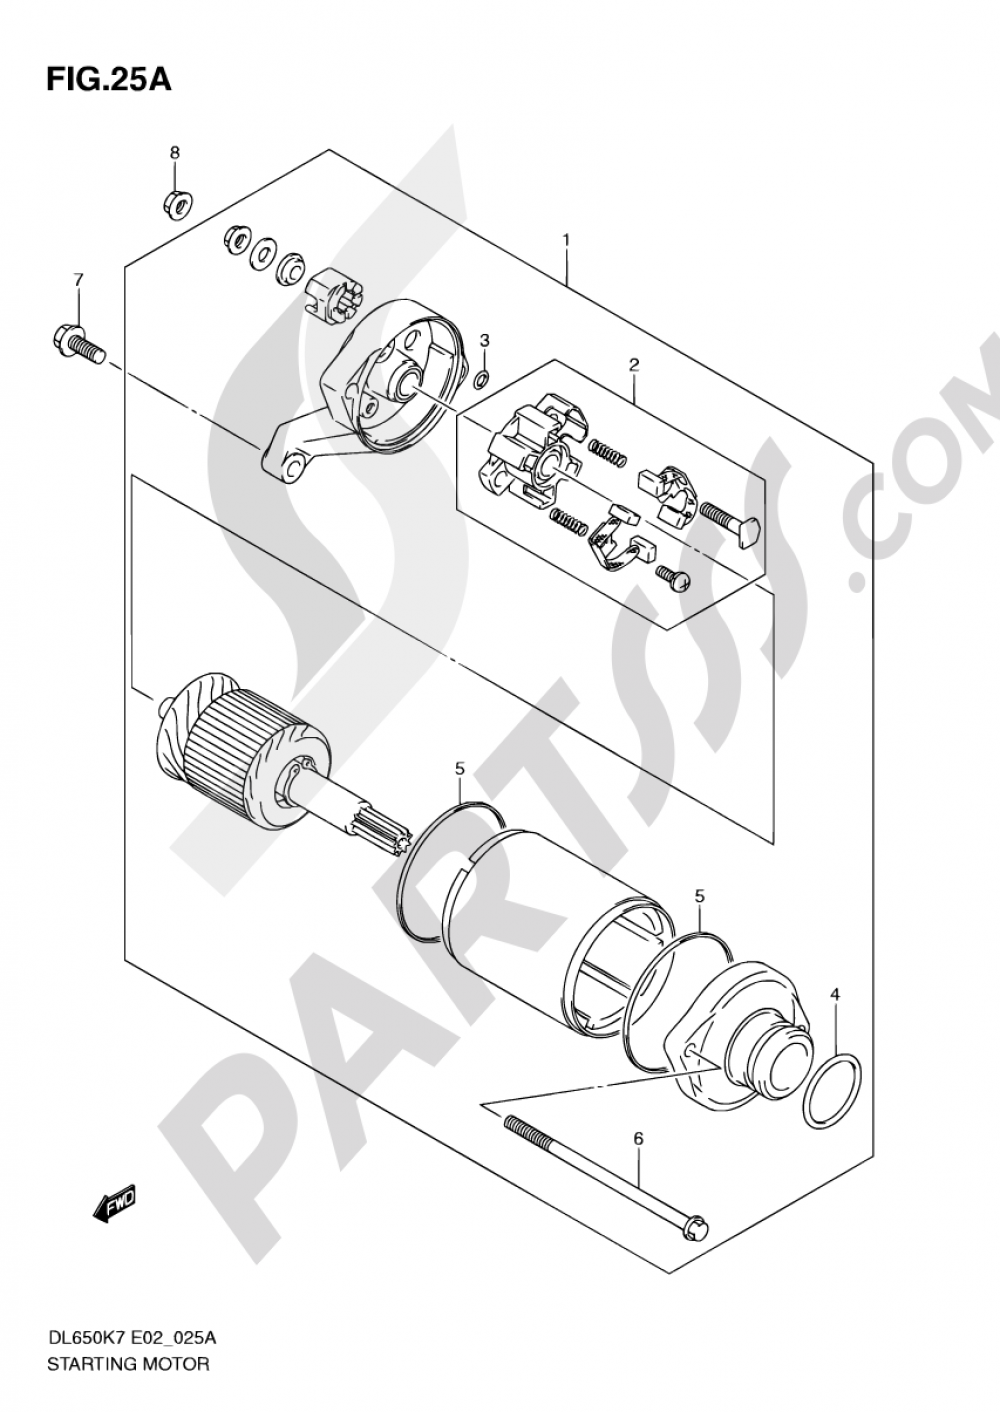 25A - STARTING MOTOR (MODEL K9 P37,MODEL L0) Suzuki VSTROM DL650 2009